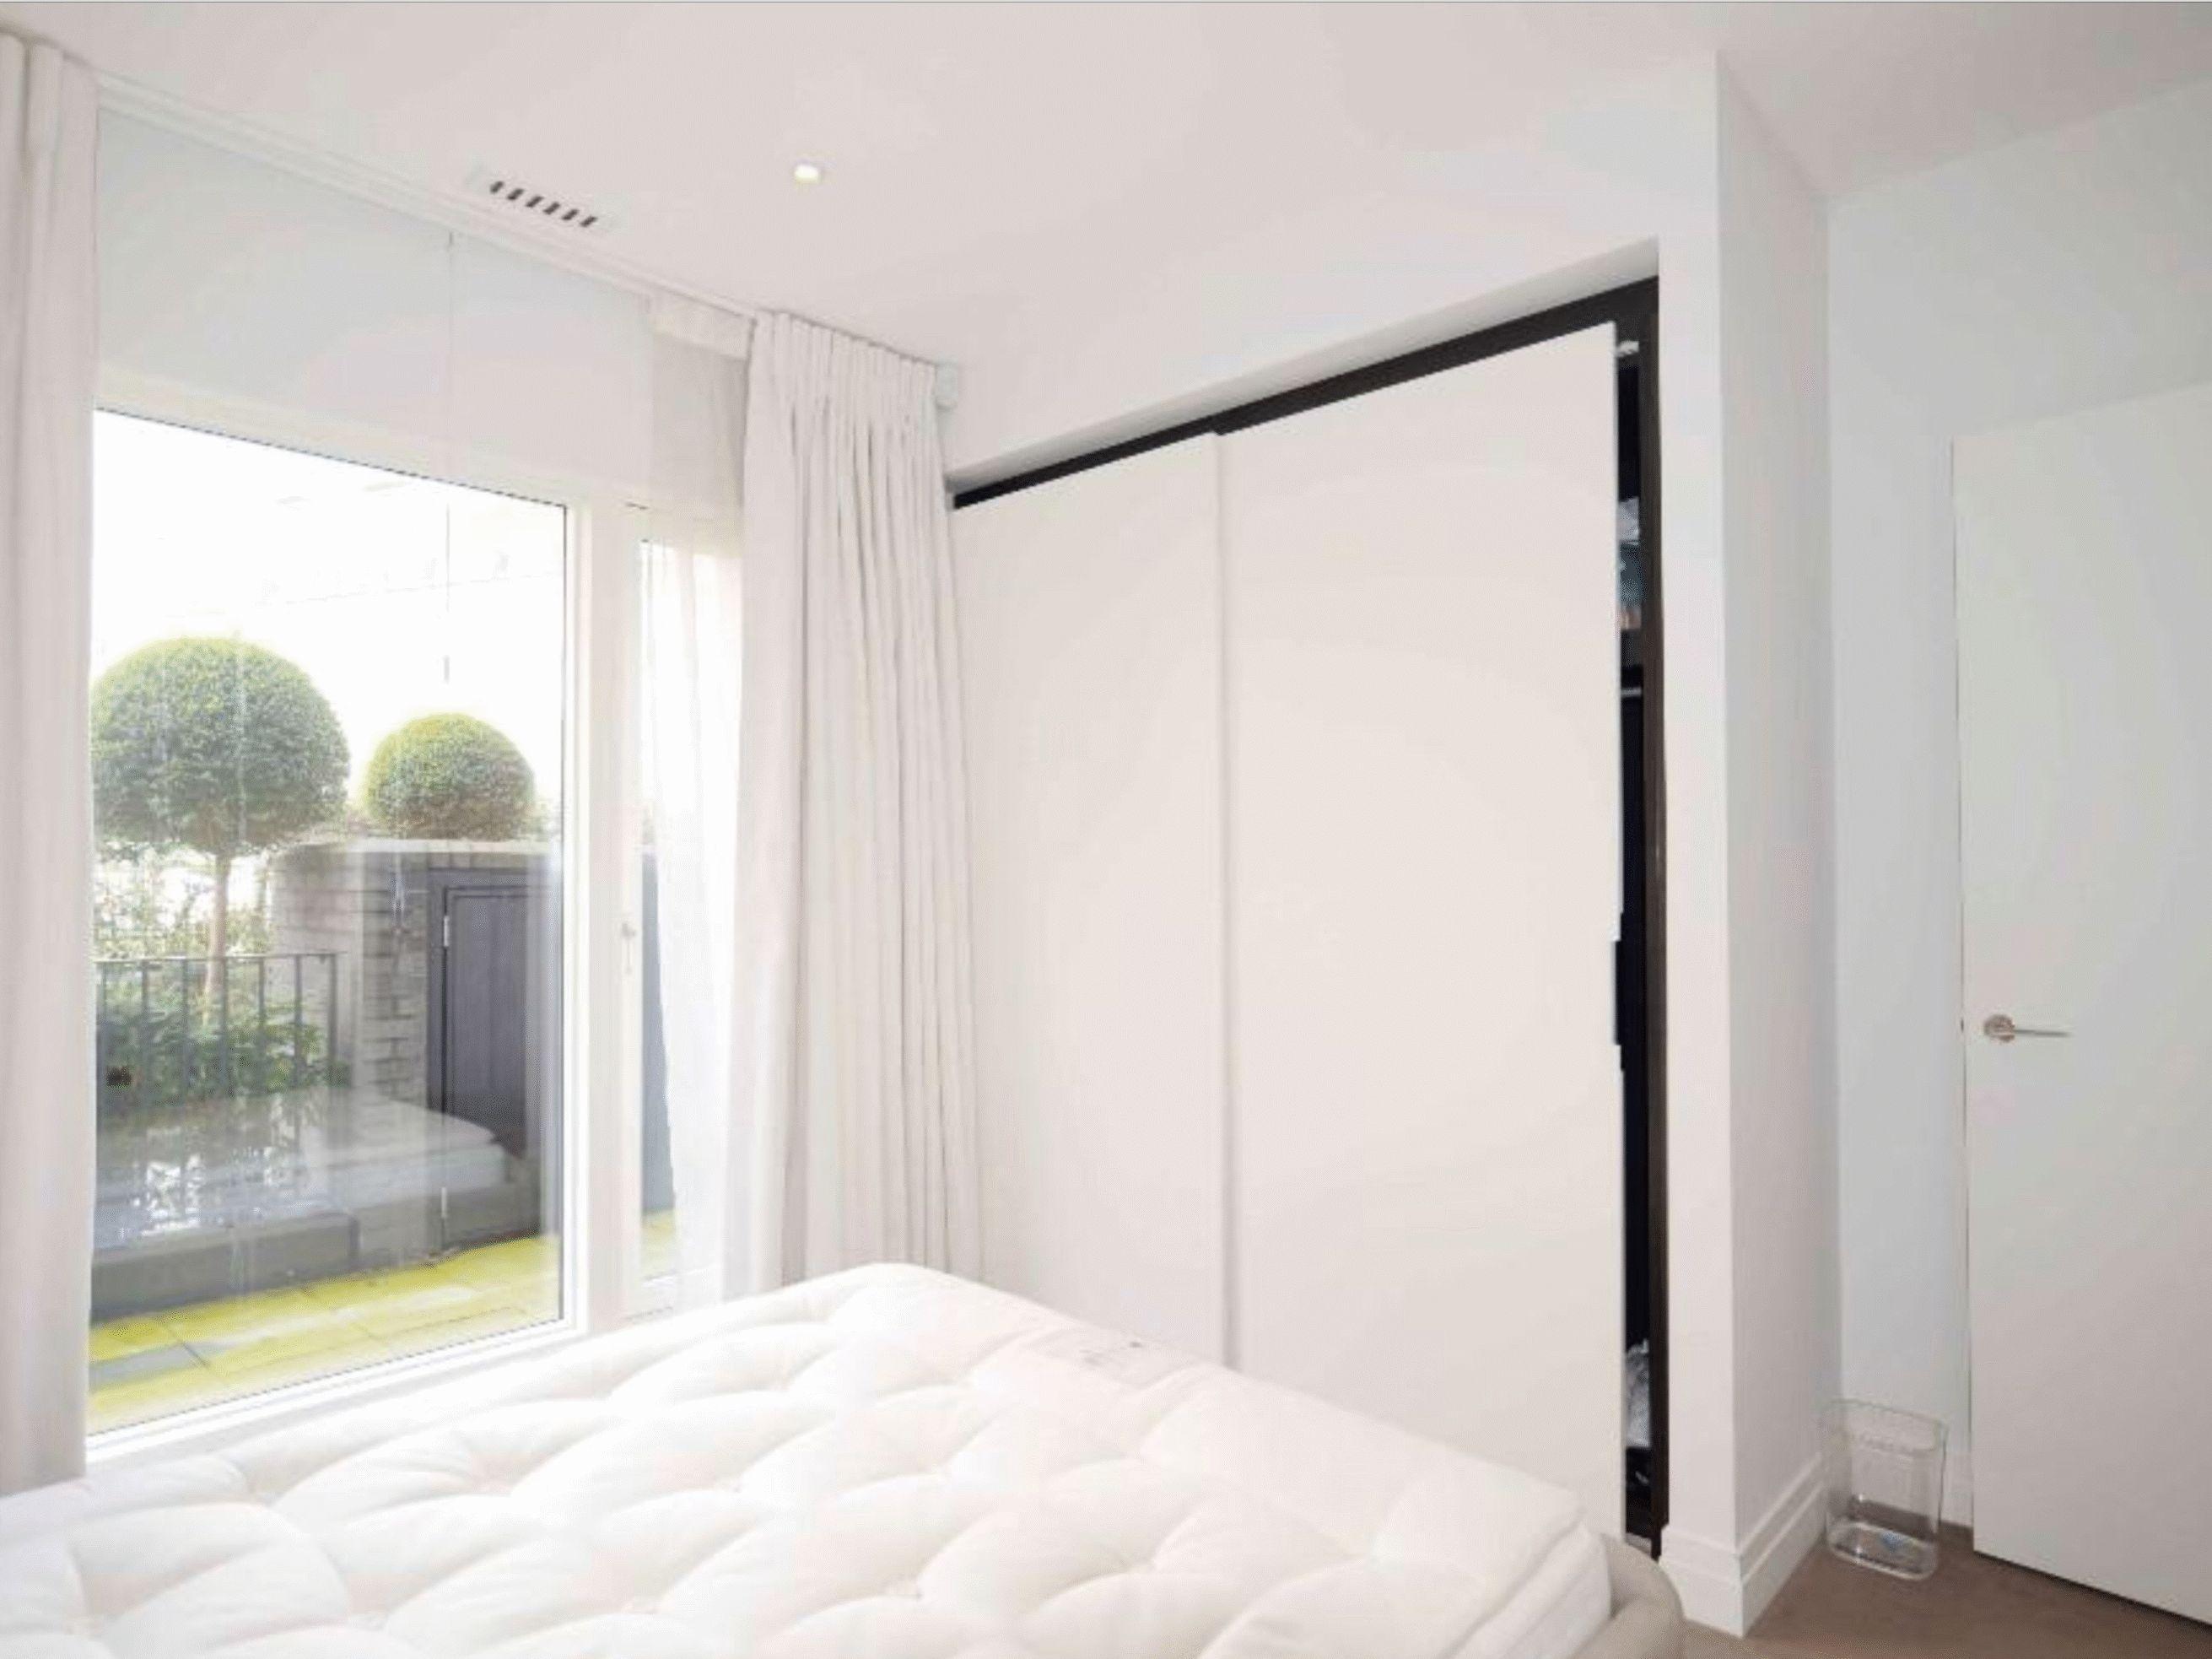 2 bed  to rent in Ebury Bridge Road  - Property Image 6